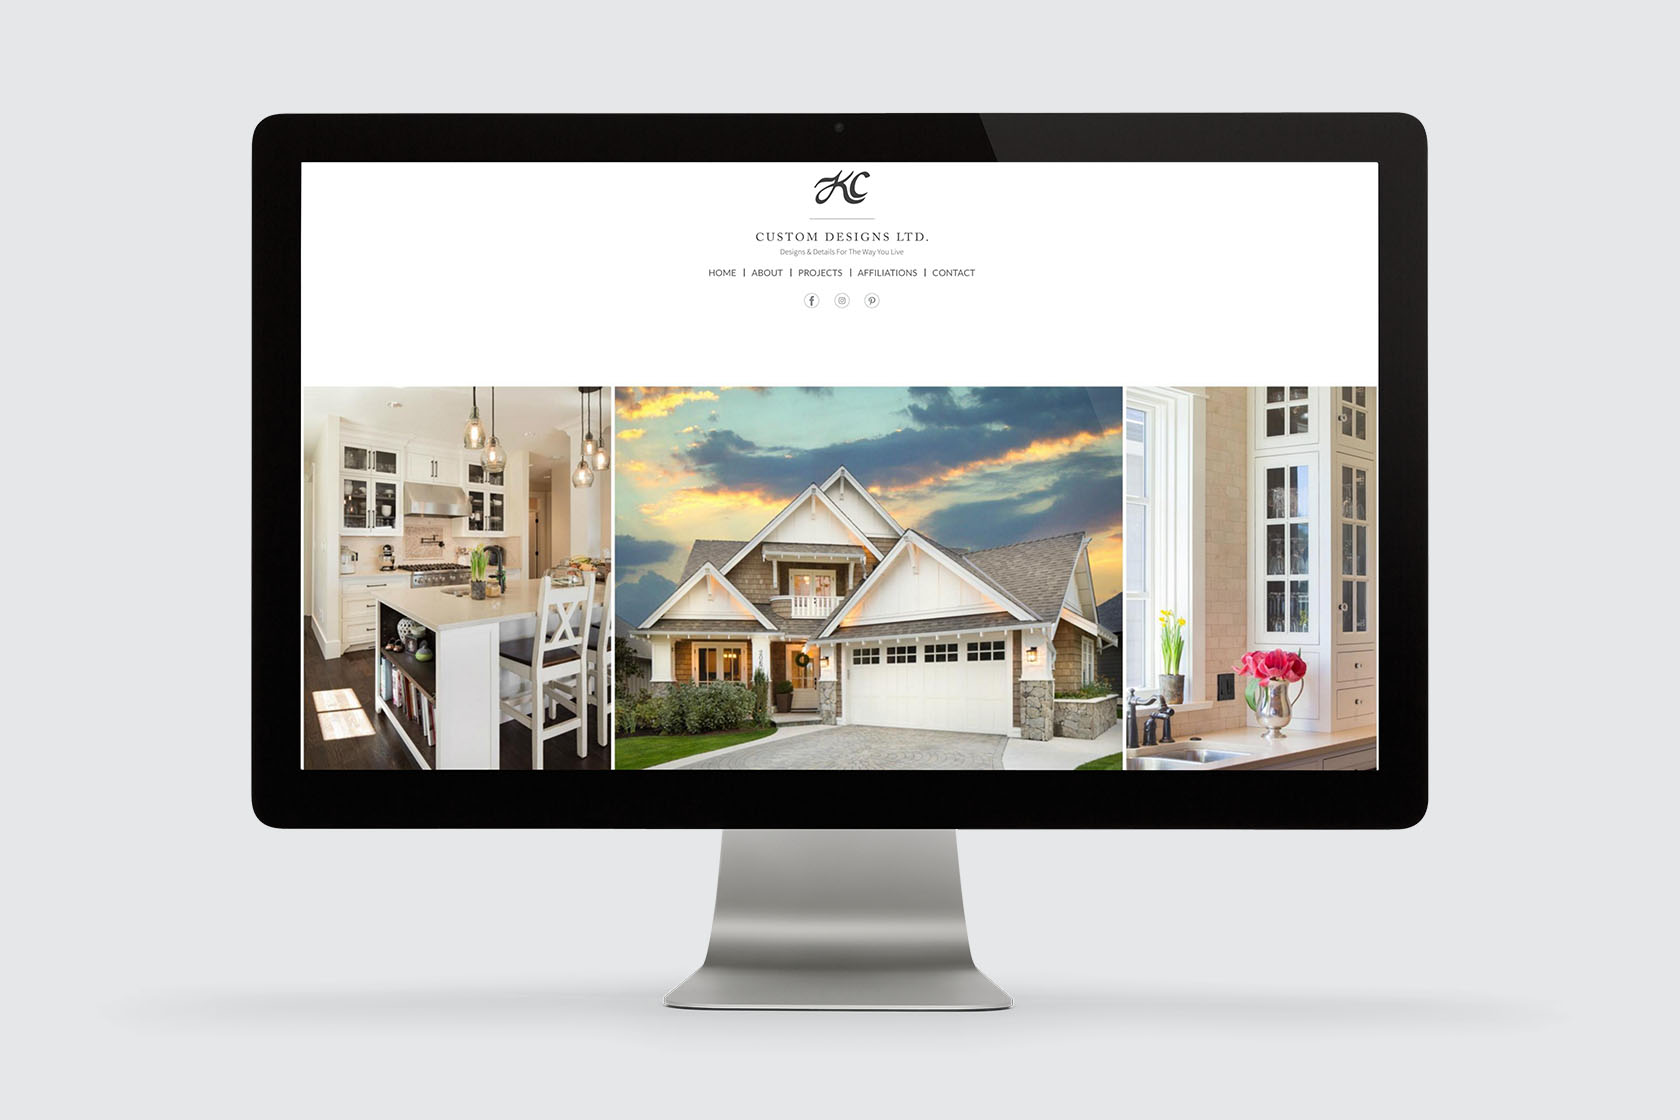 Kc custom designs ltd for Design homes kc